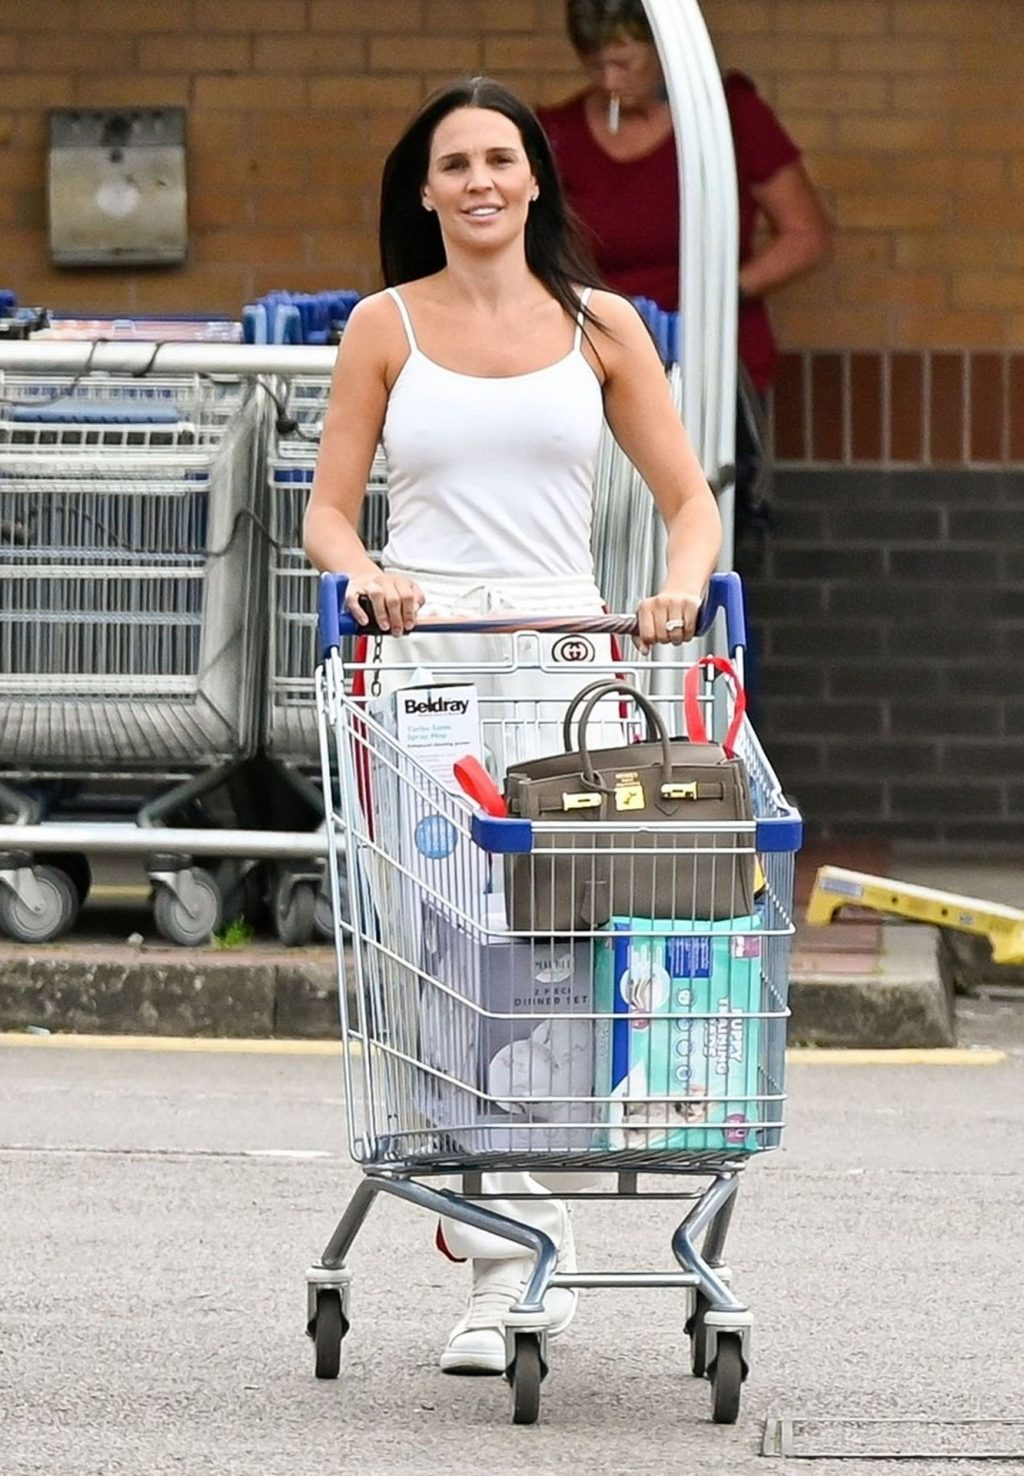 Braless Danielle Lloyd Is Seen in Birmingham (21 Photos)